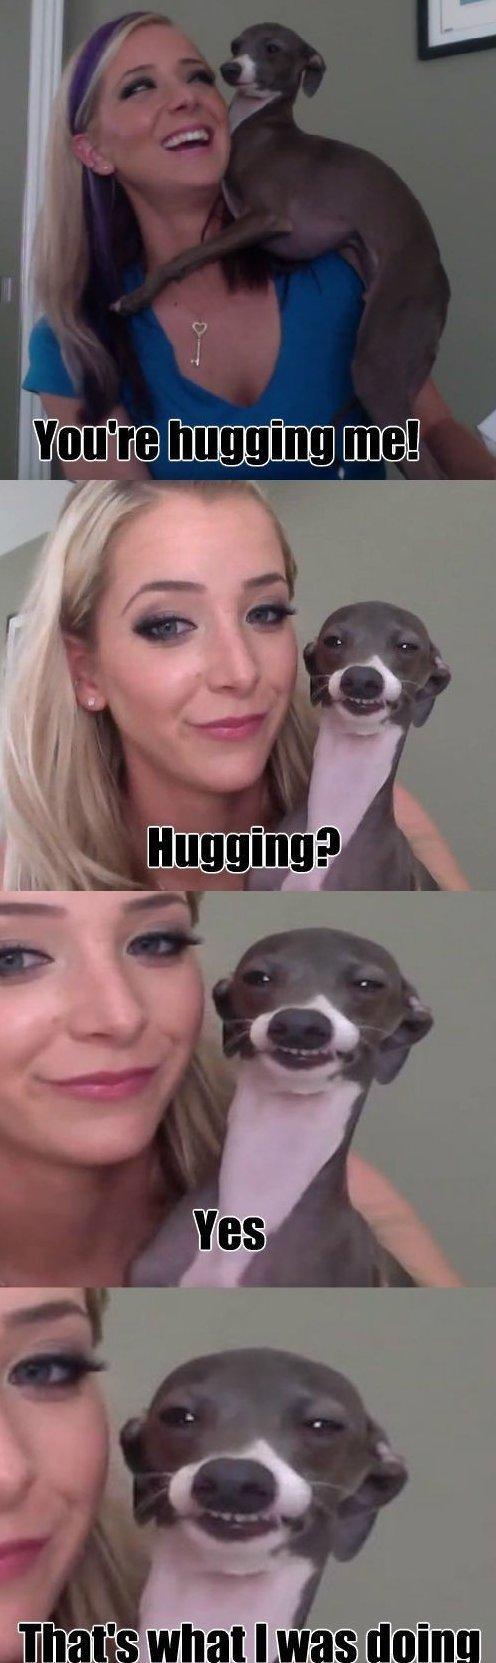 hugging. .. You lucky bastard. hugging You lucky bastard